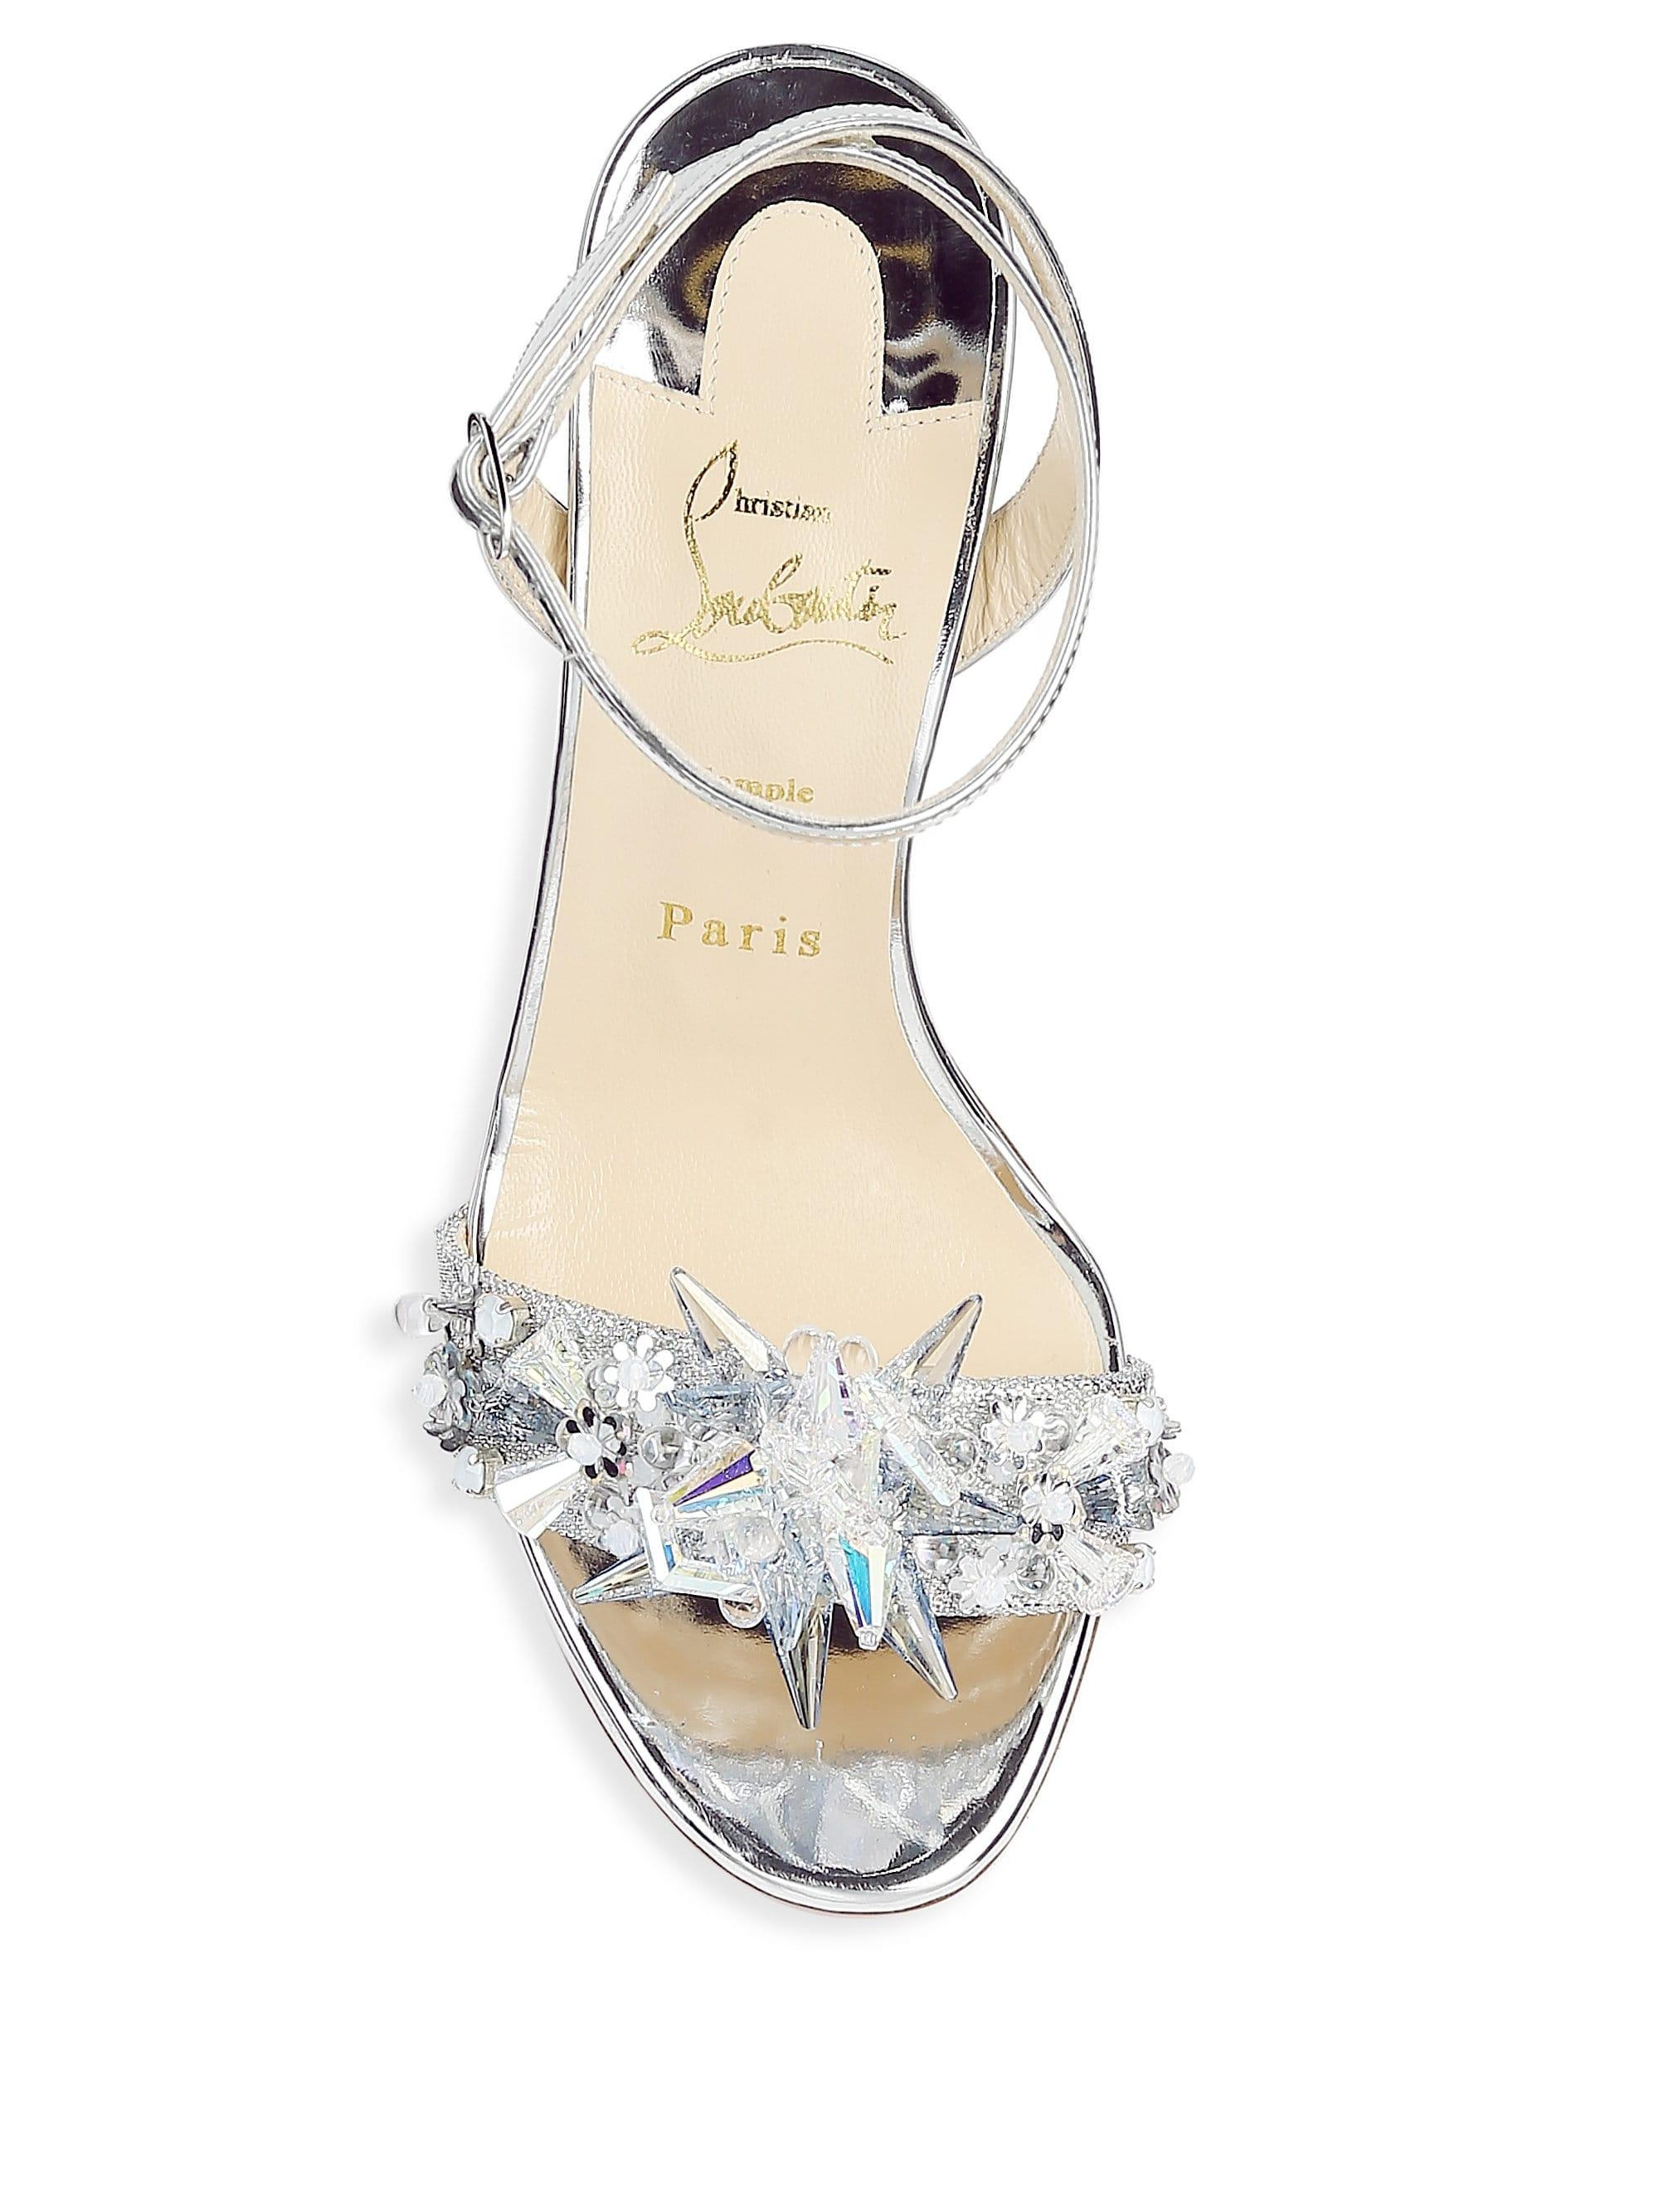 ebfb0c225 Christian Louboutin Oxydock 100 Metallic Crystal Sandals in Metallic ...